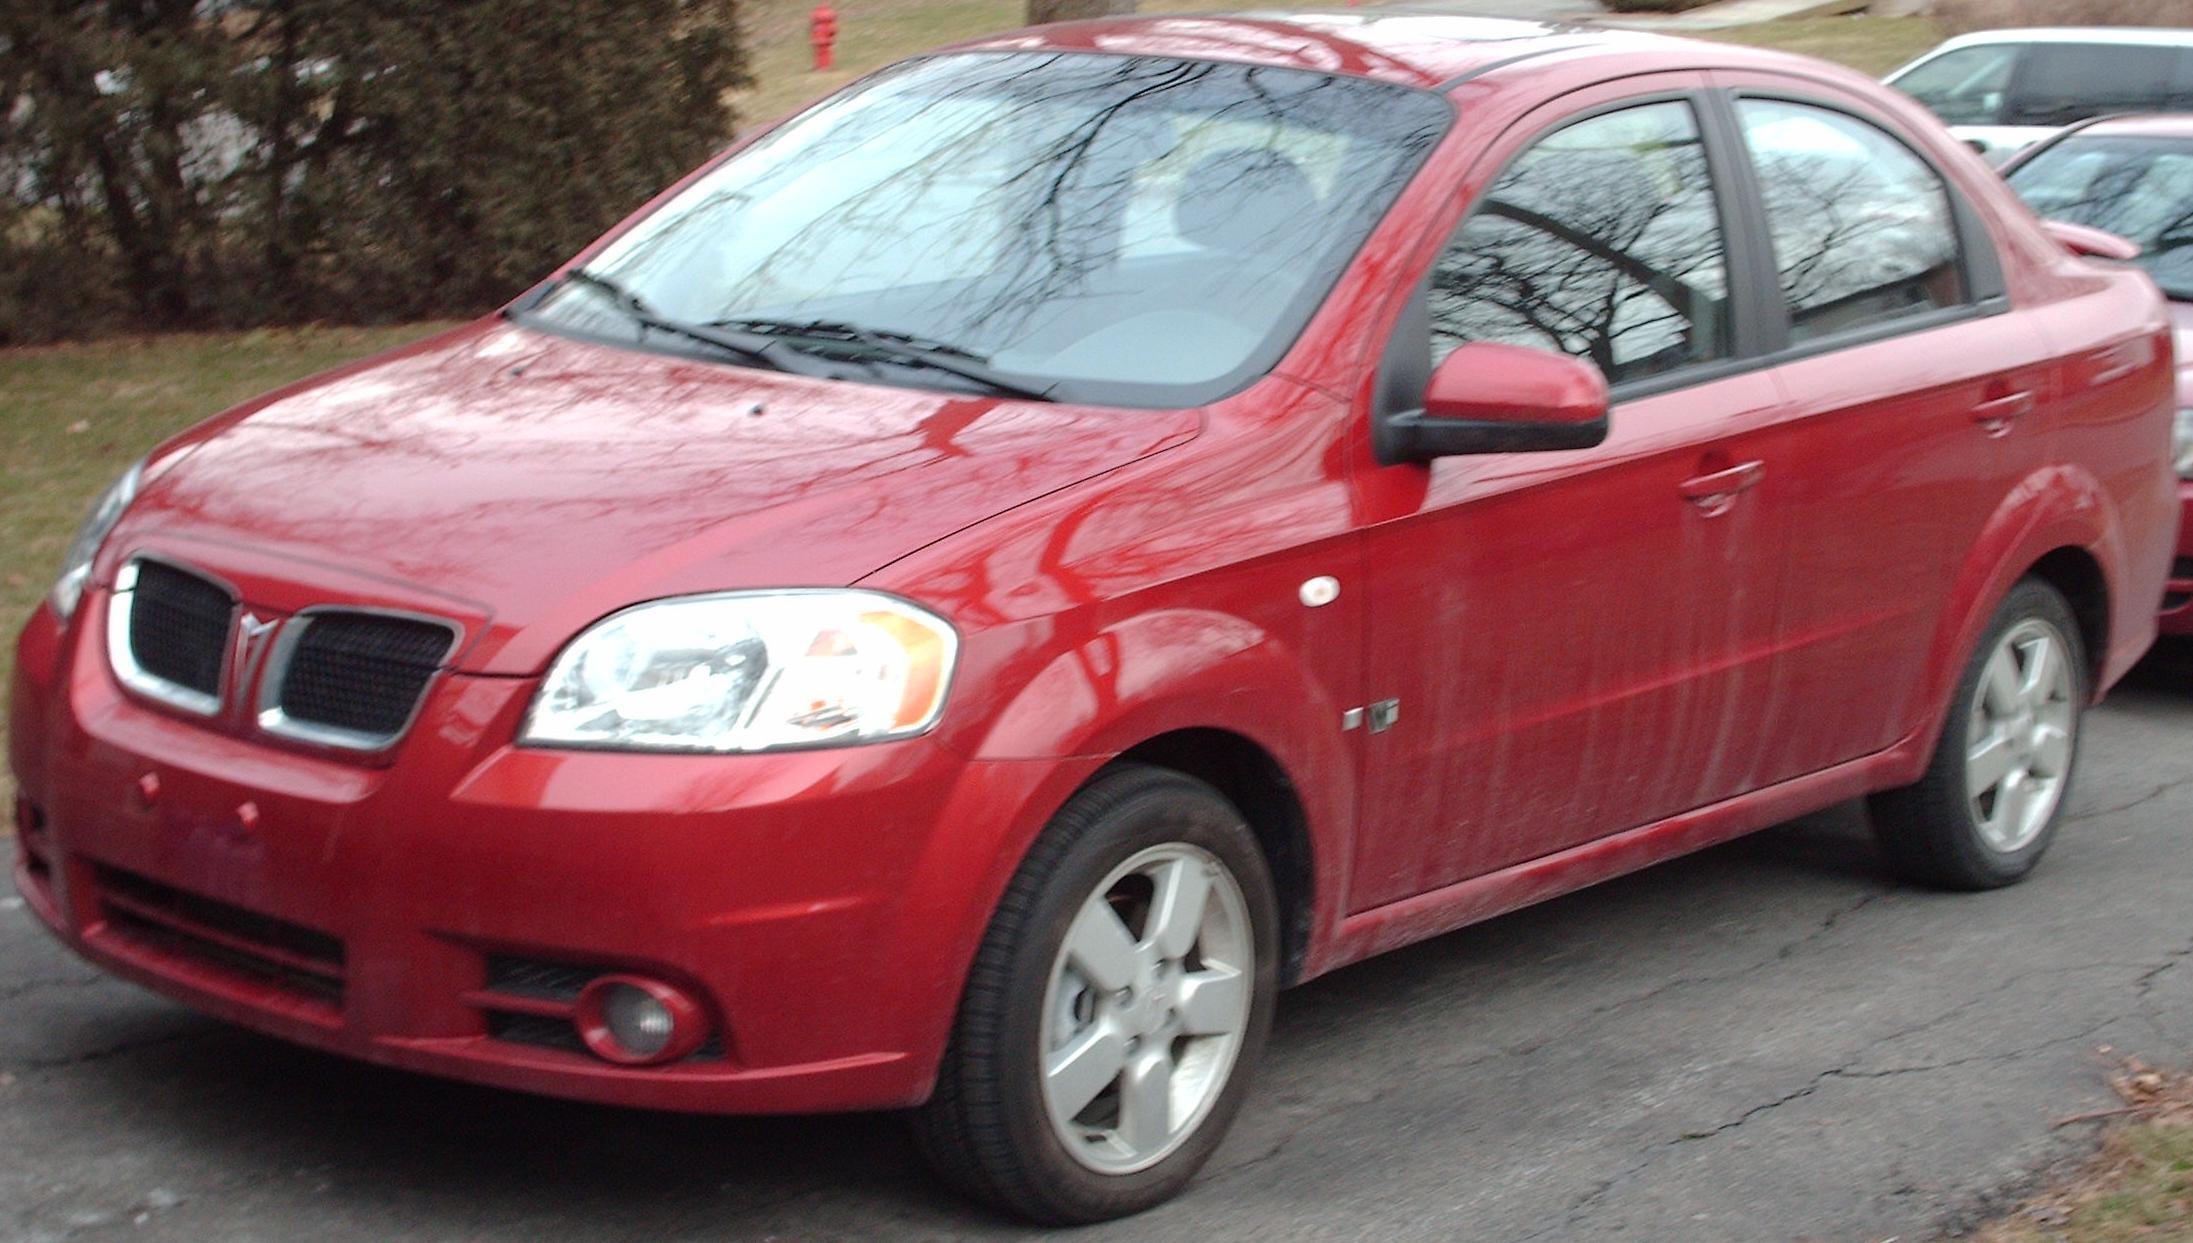 Chevrolet Aveo (T200) - Wikipedia on